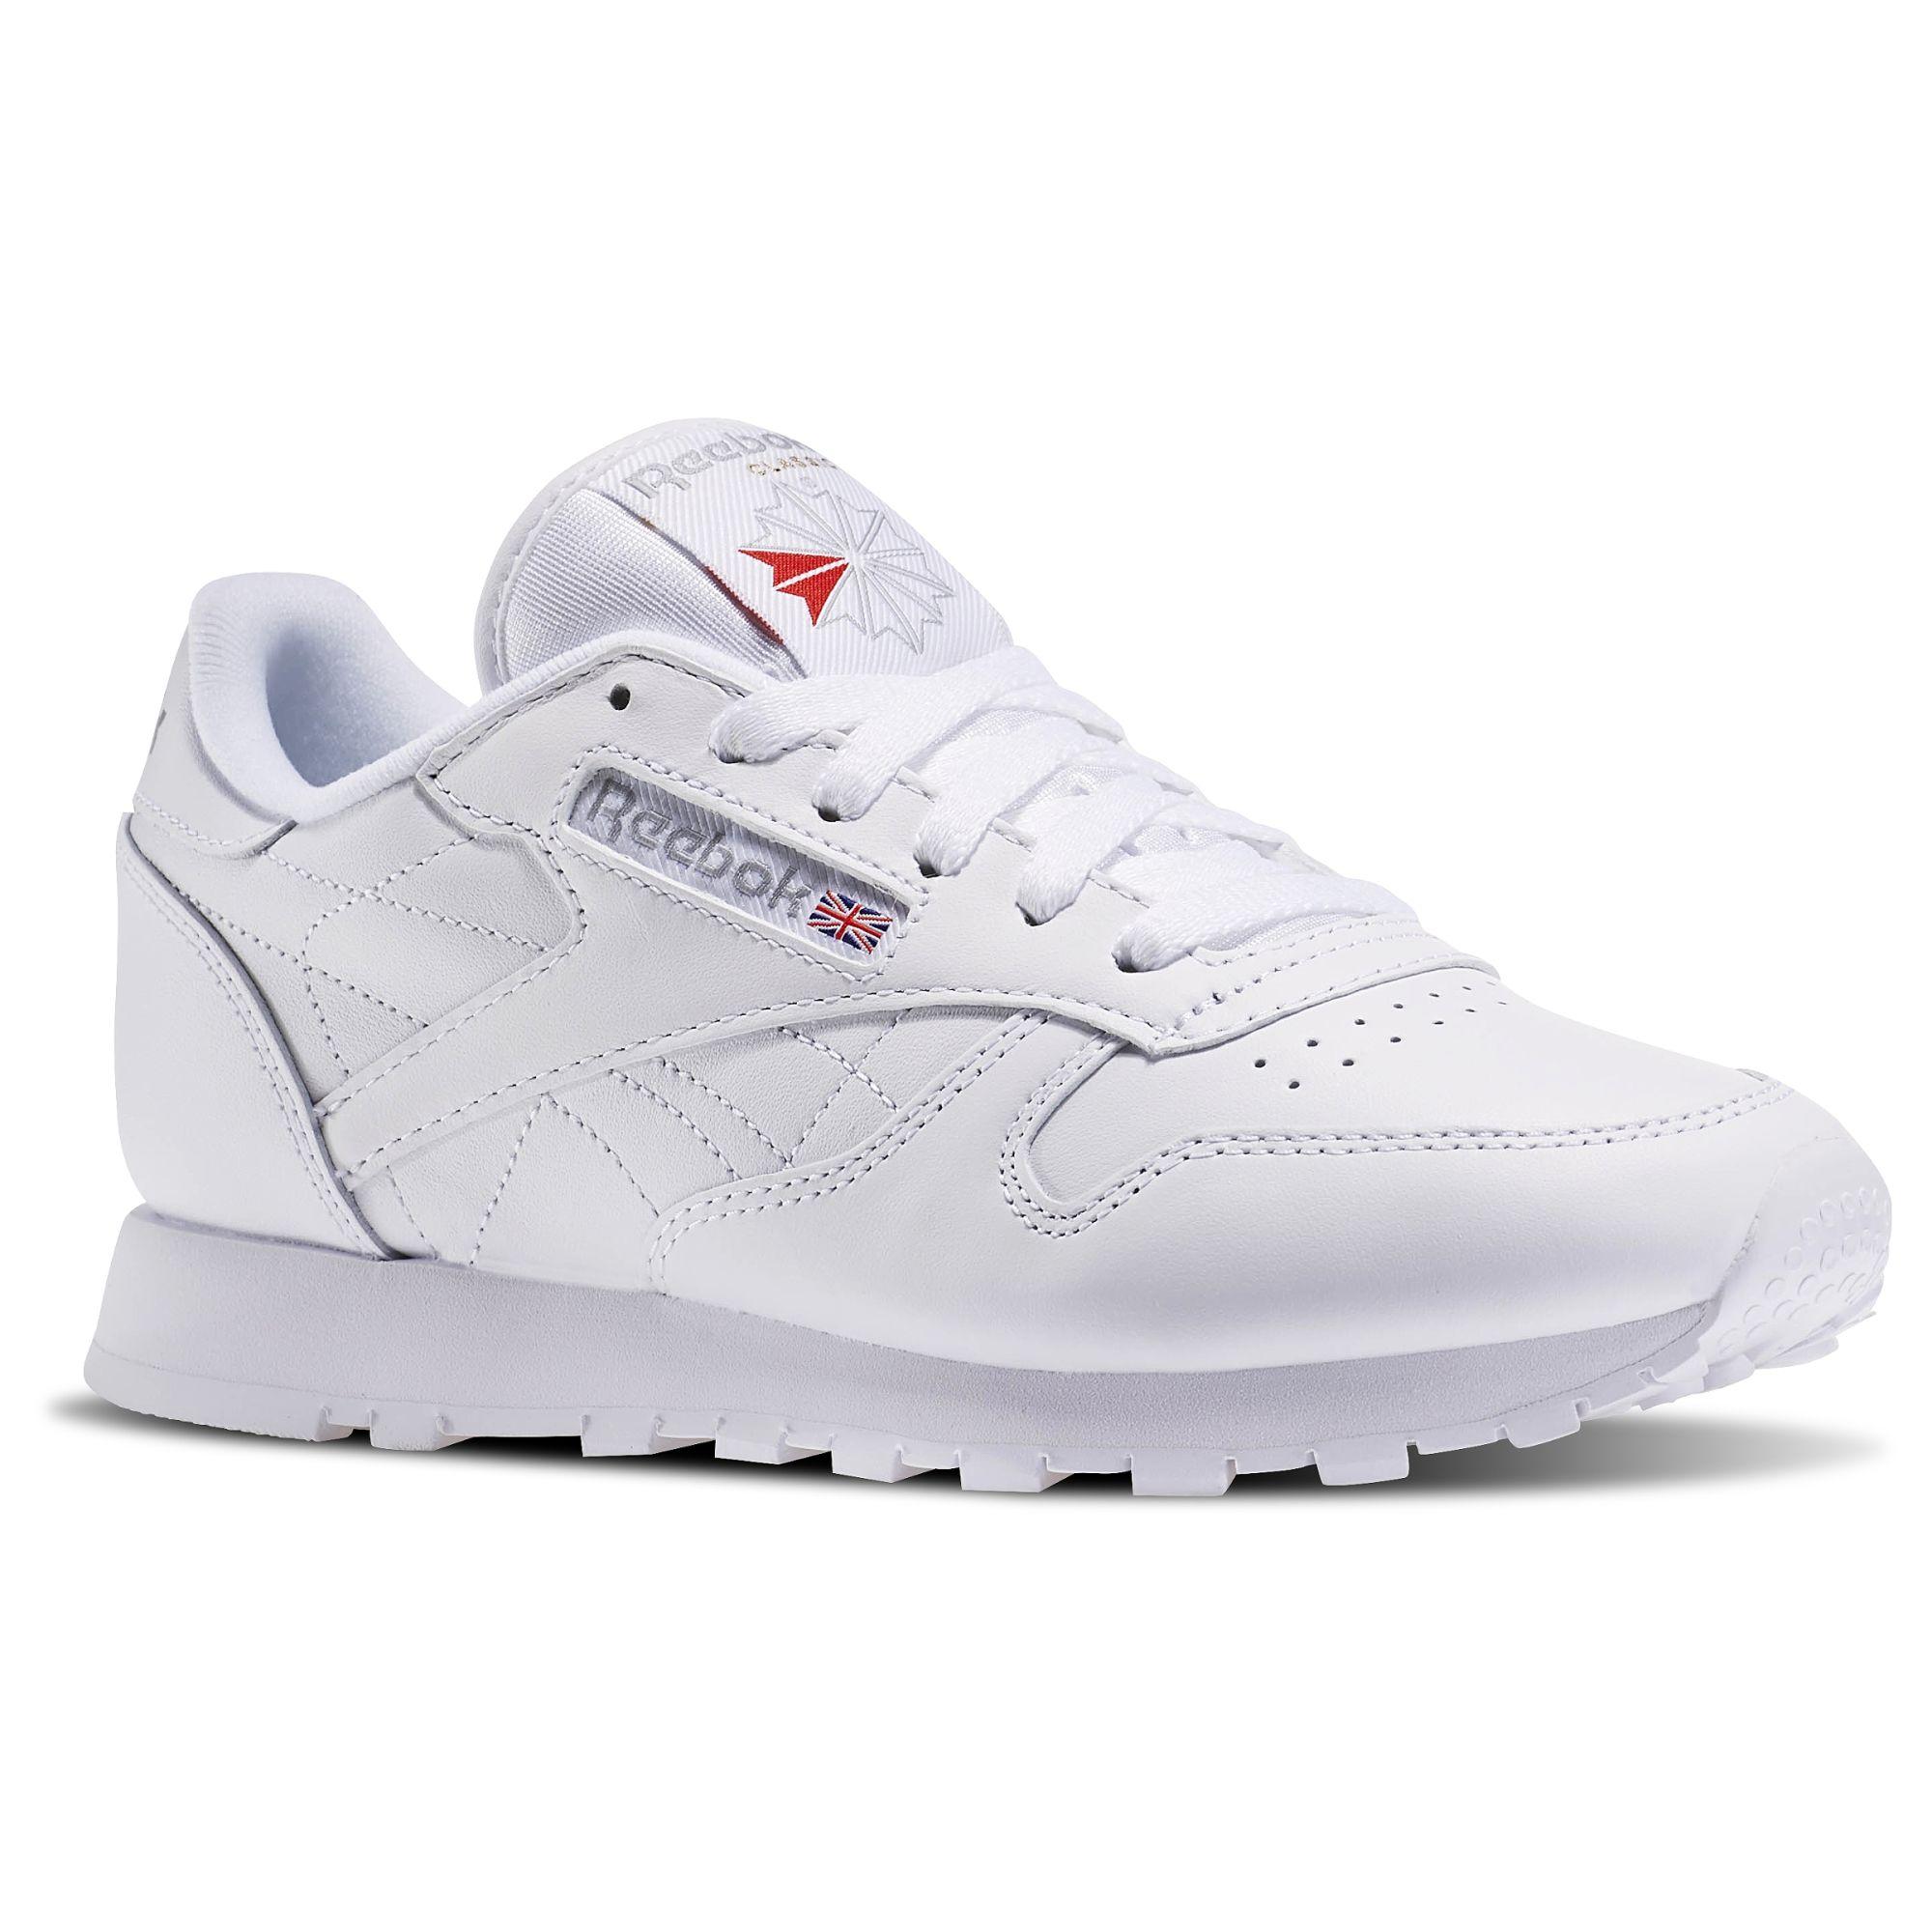 Reebok High Top Tennis Shoes